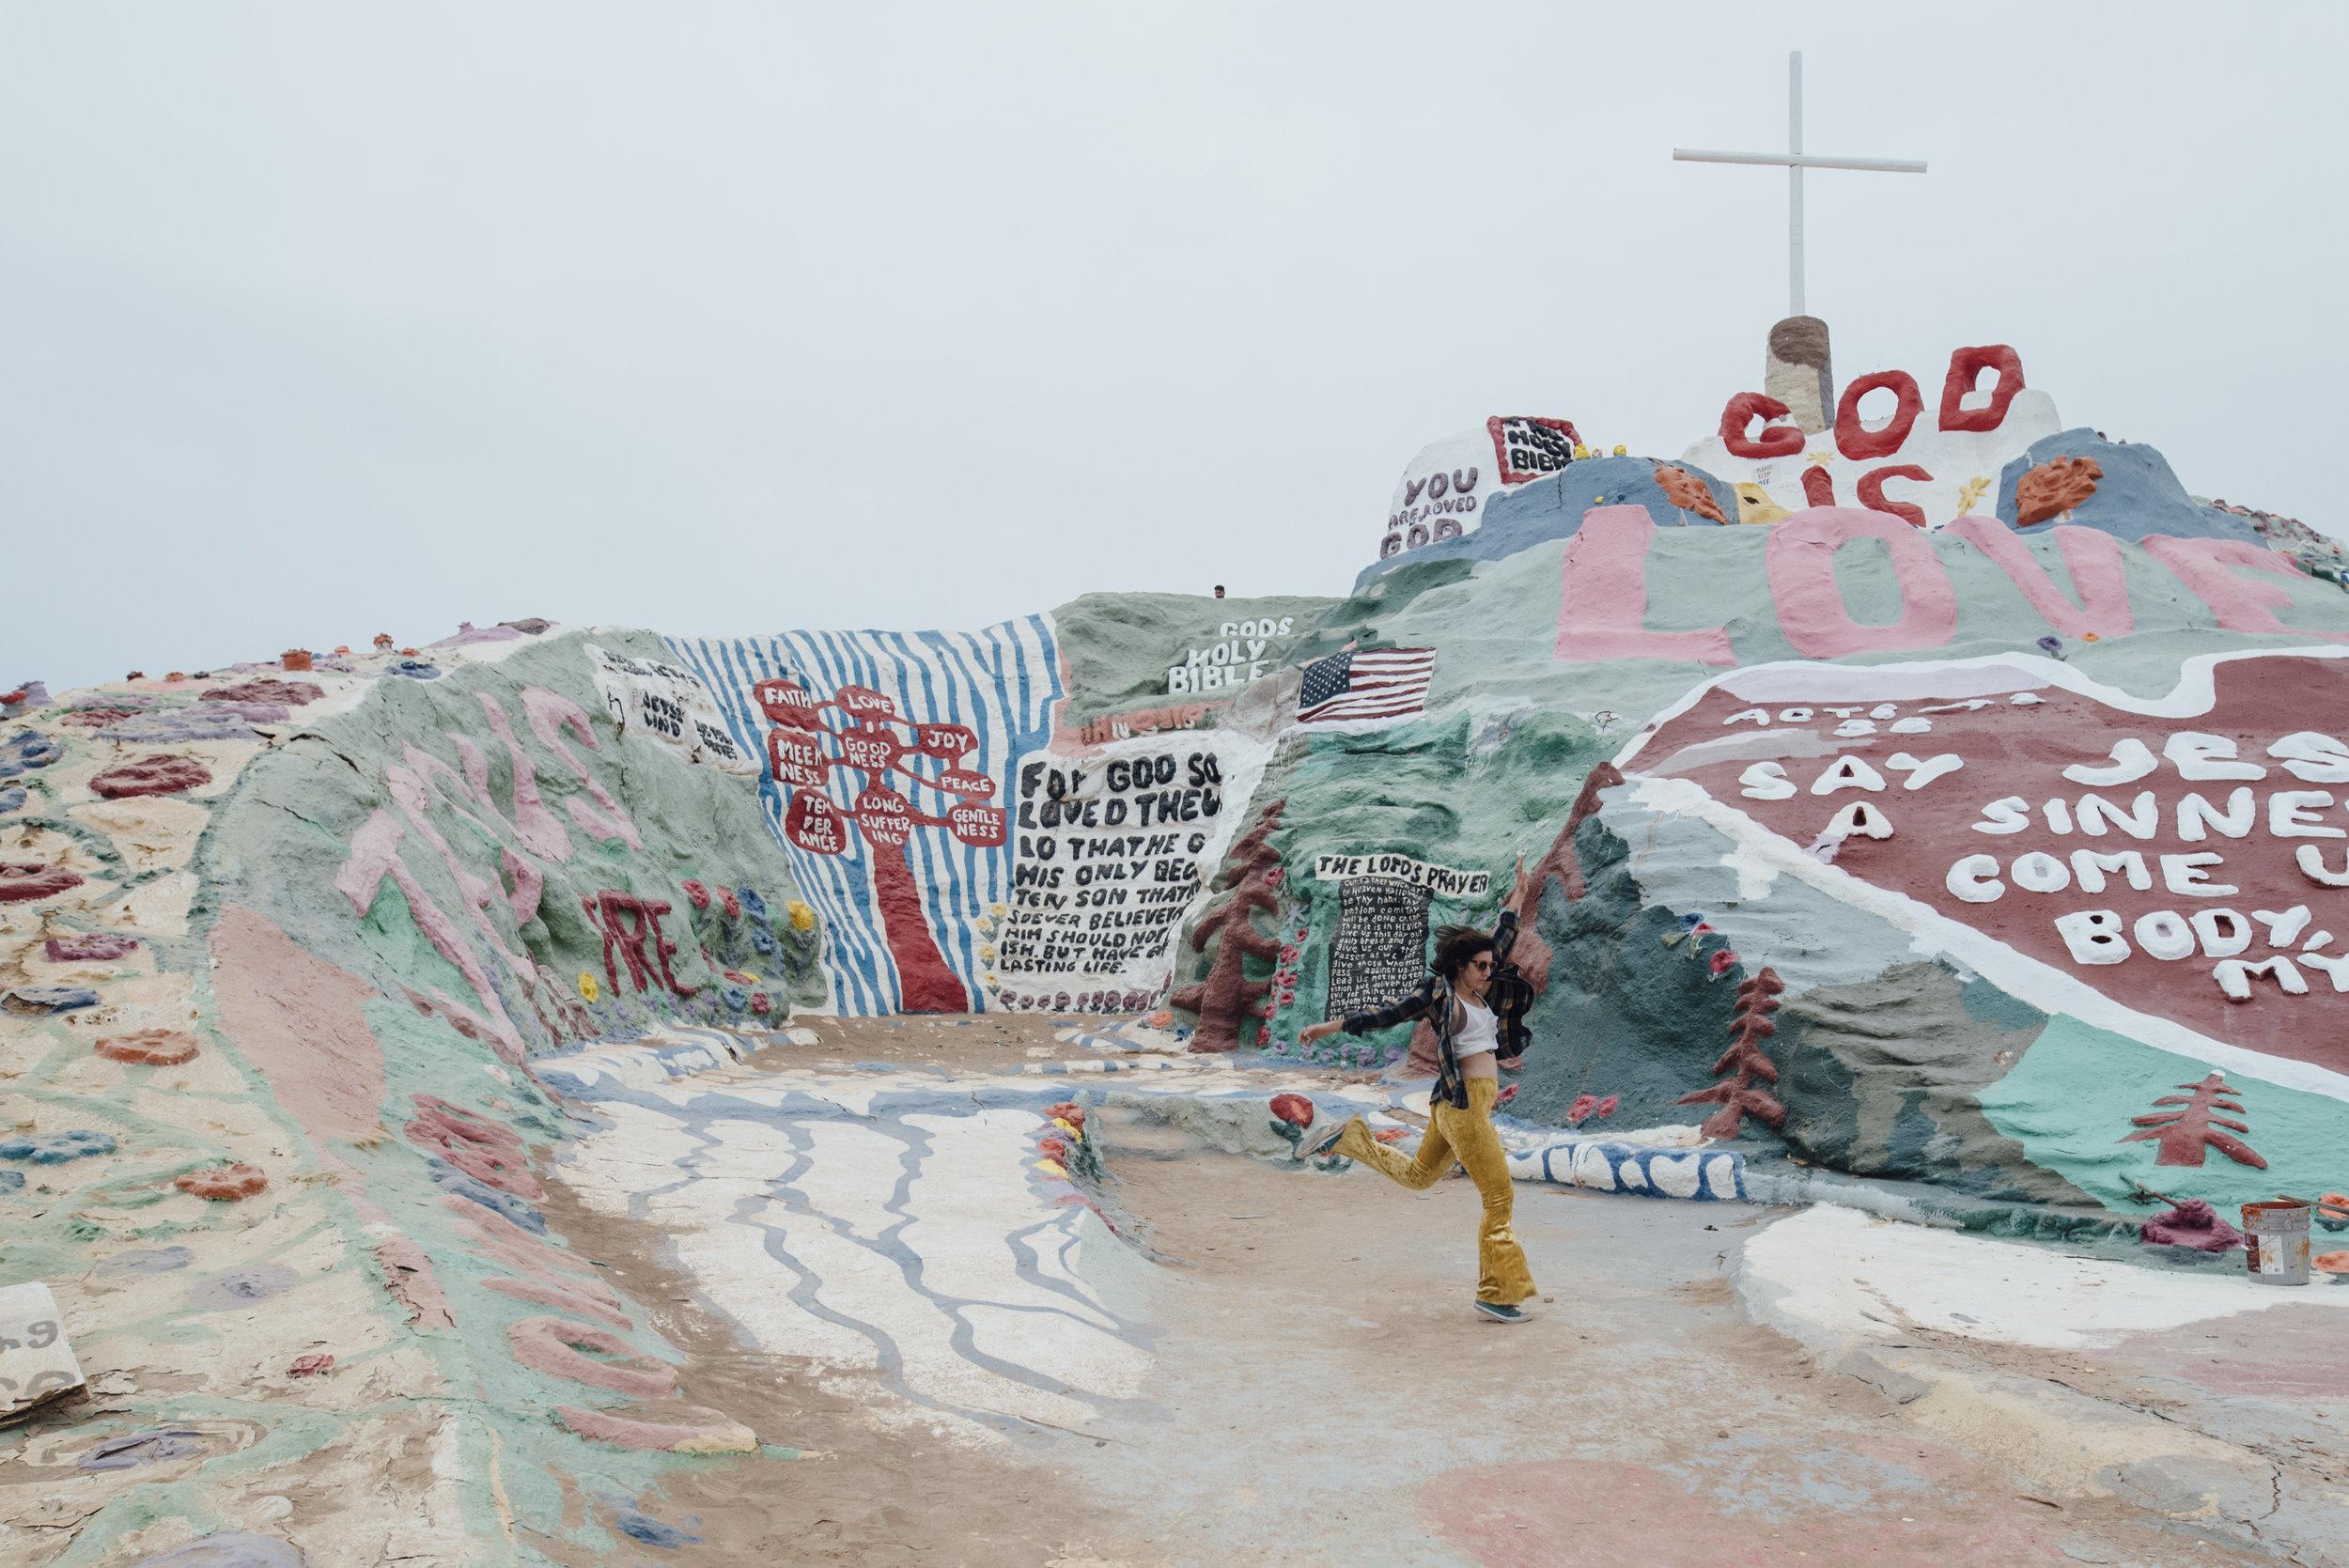 Salvation Mountain - Niland, CA 1/3/18 with Yazmine Zoraida